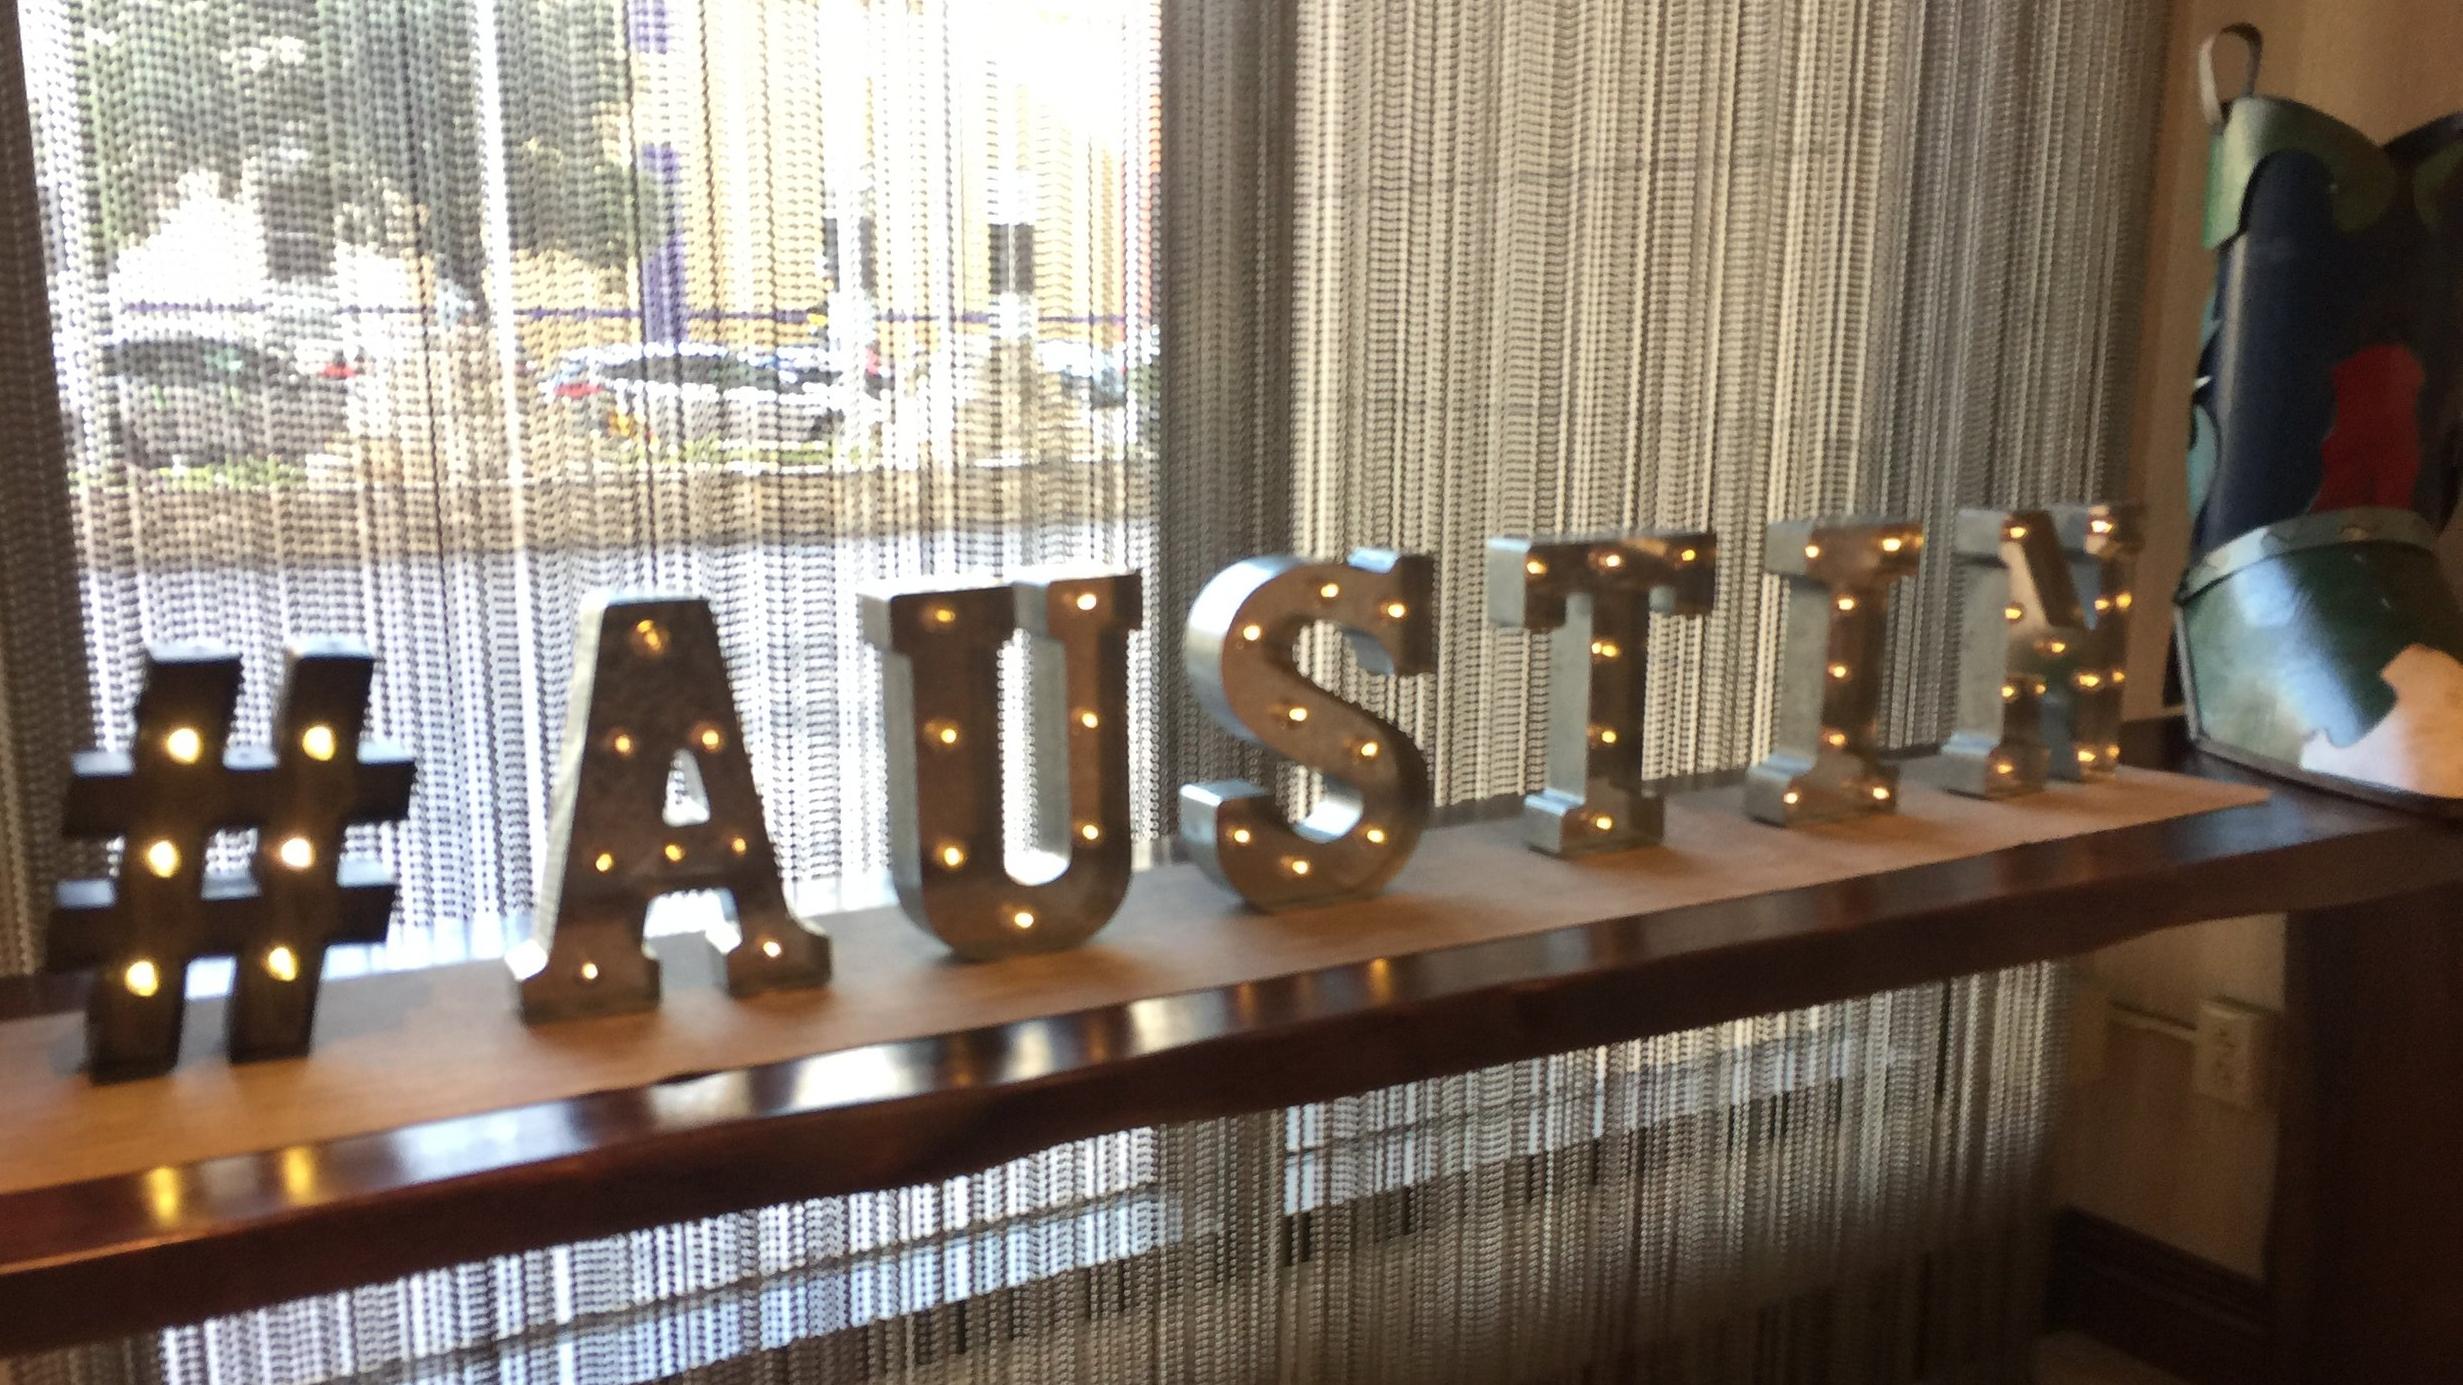 2018-07-04 Austin decoration at hotel.JPG